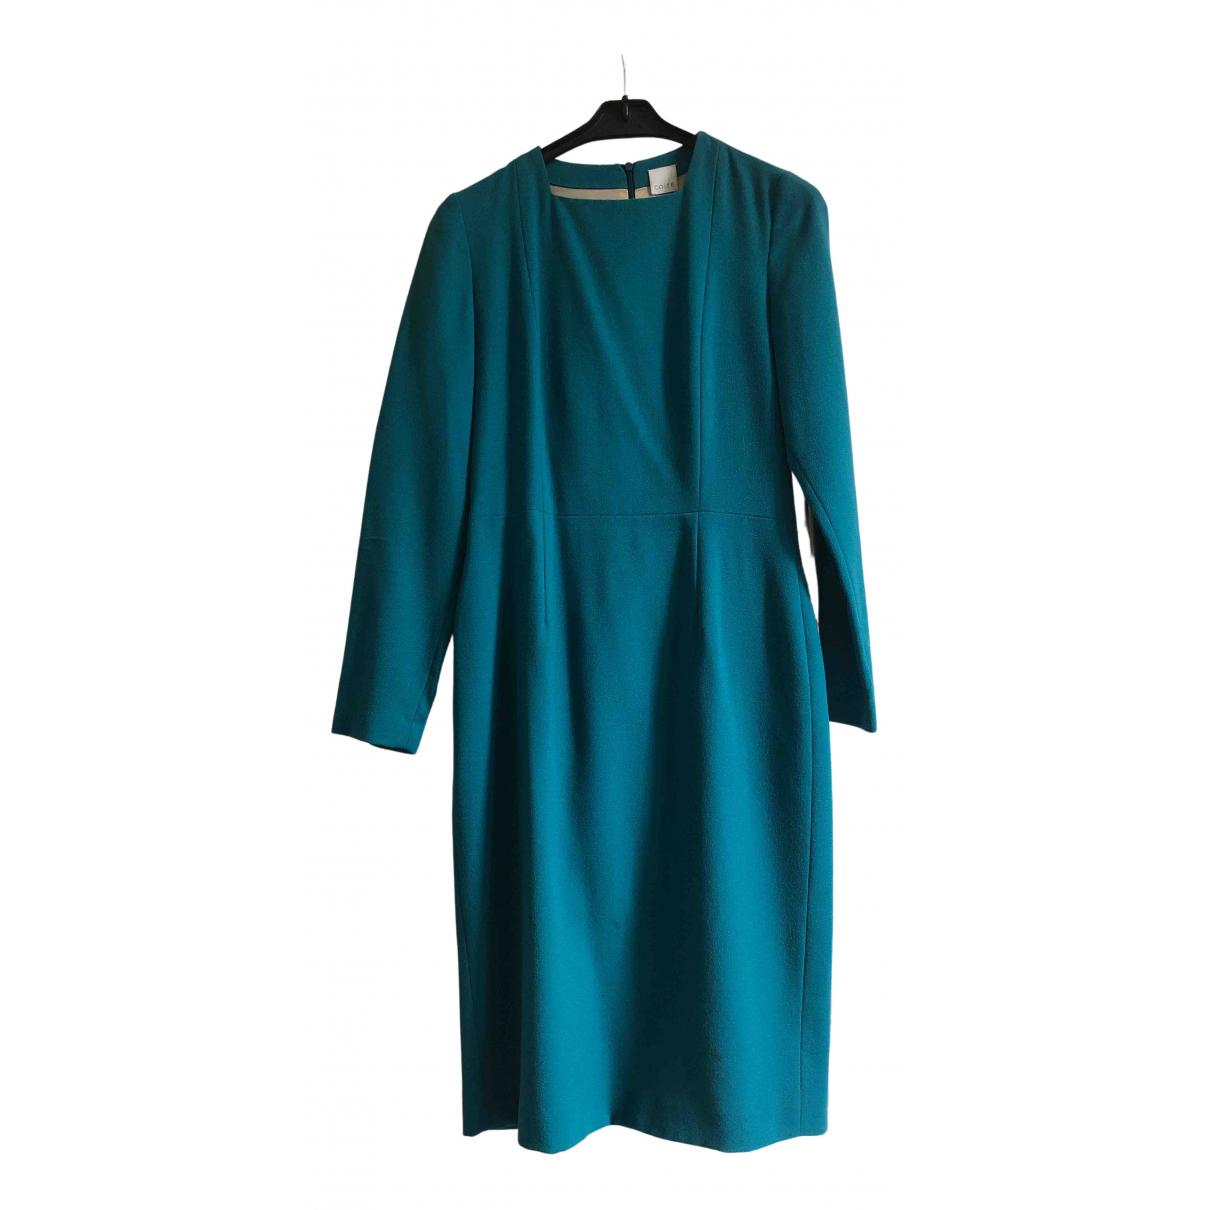 Cote \N Kleid in  Gruen Seide